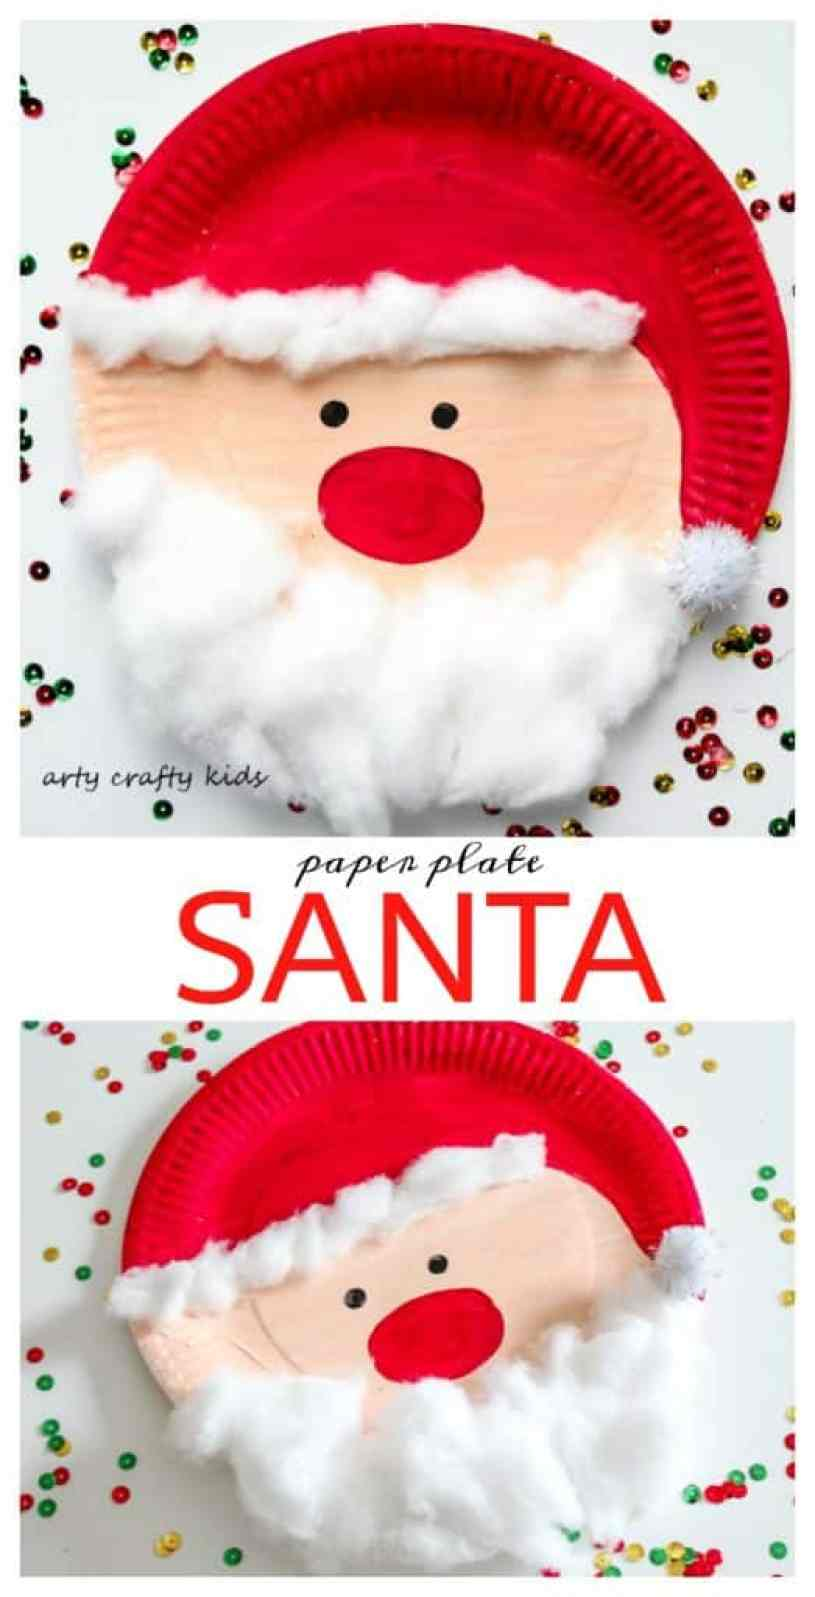 arty crafty kids seasonal easy chrsitmas craft paper plate santa super cute - Santa Claus Craft